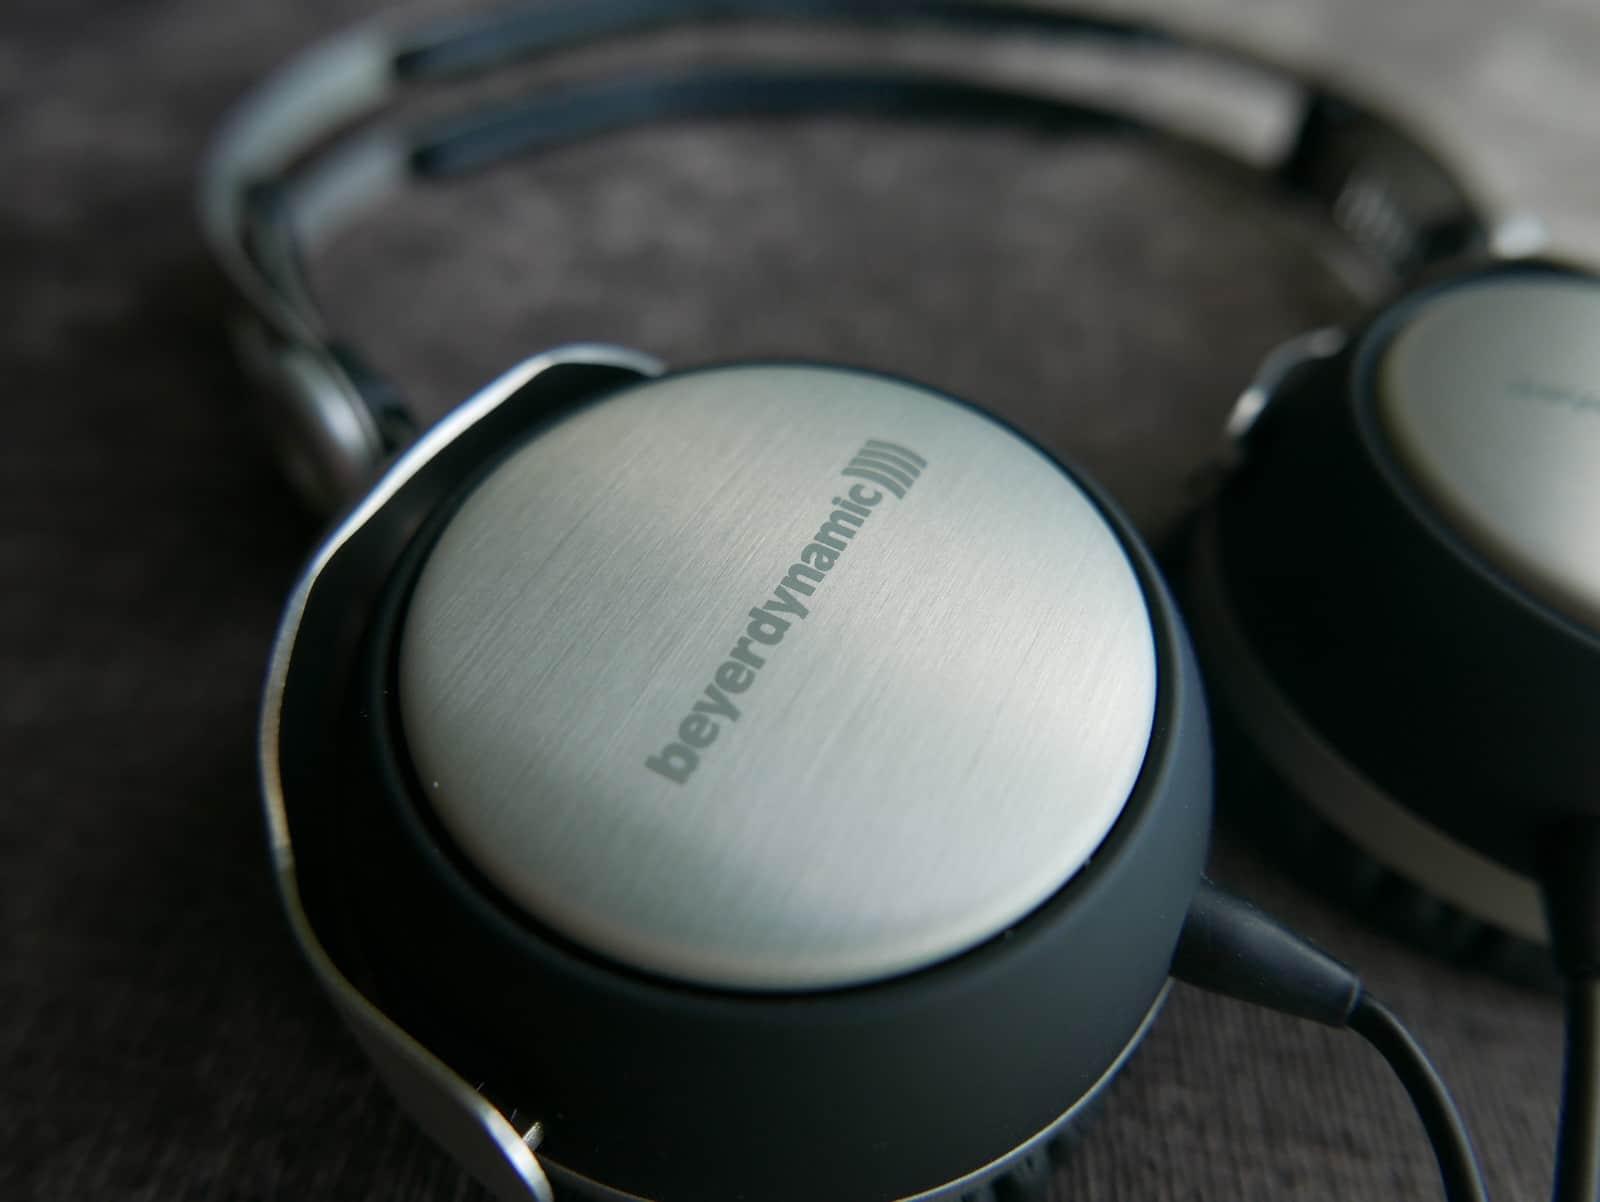 Top 7 Most Comfortable On-ear Headphones in 2020 4